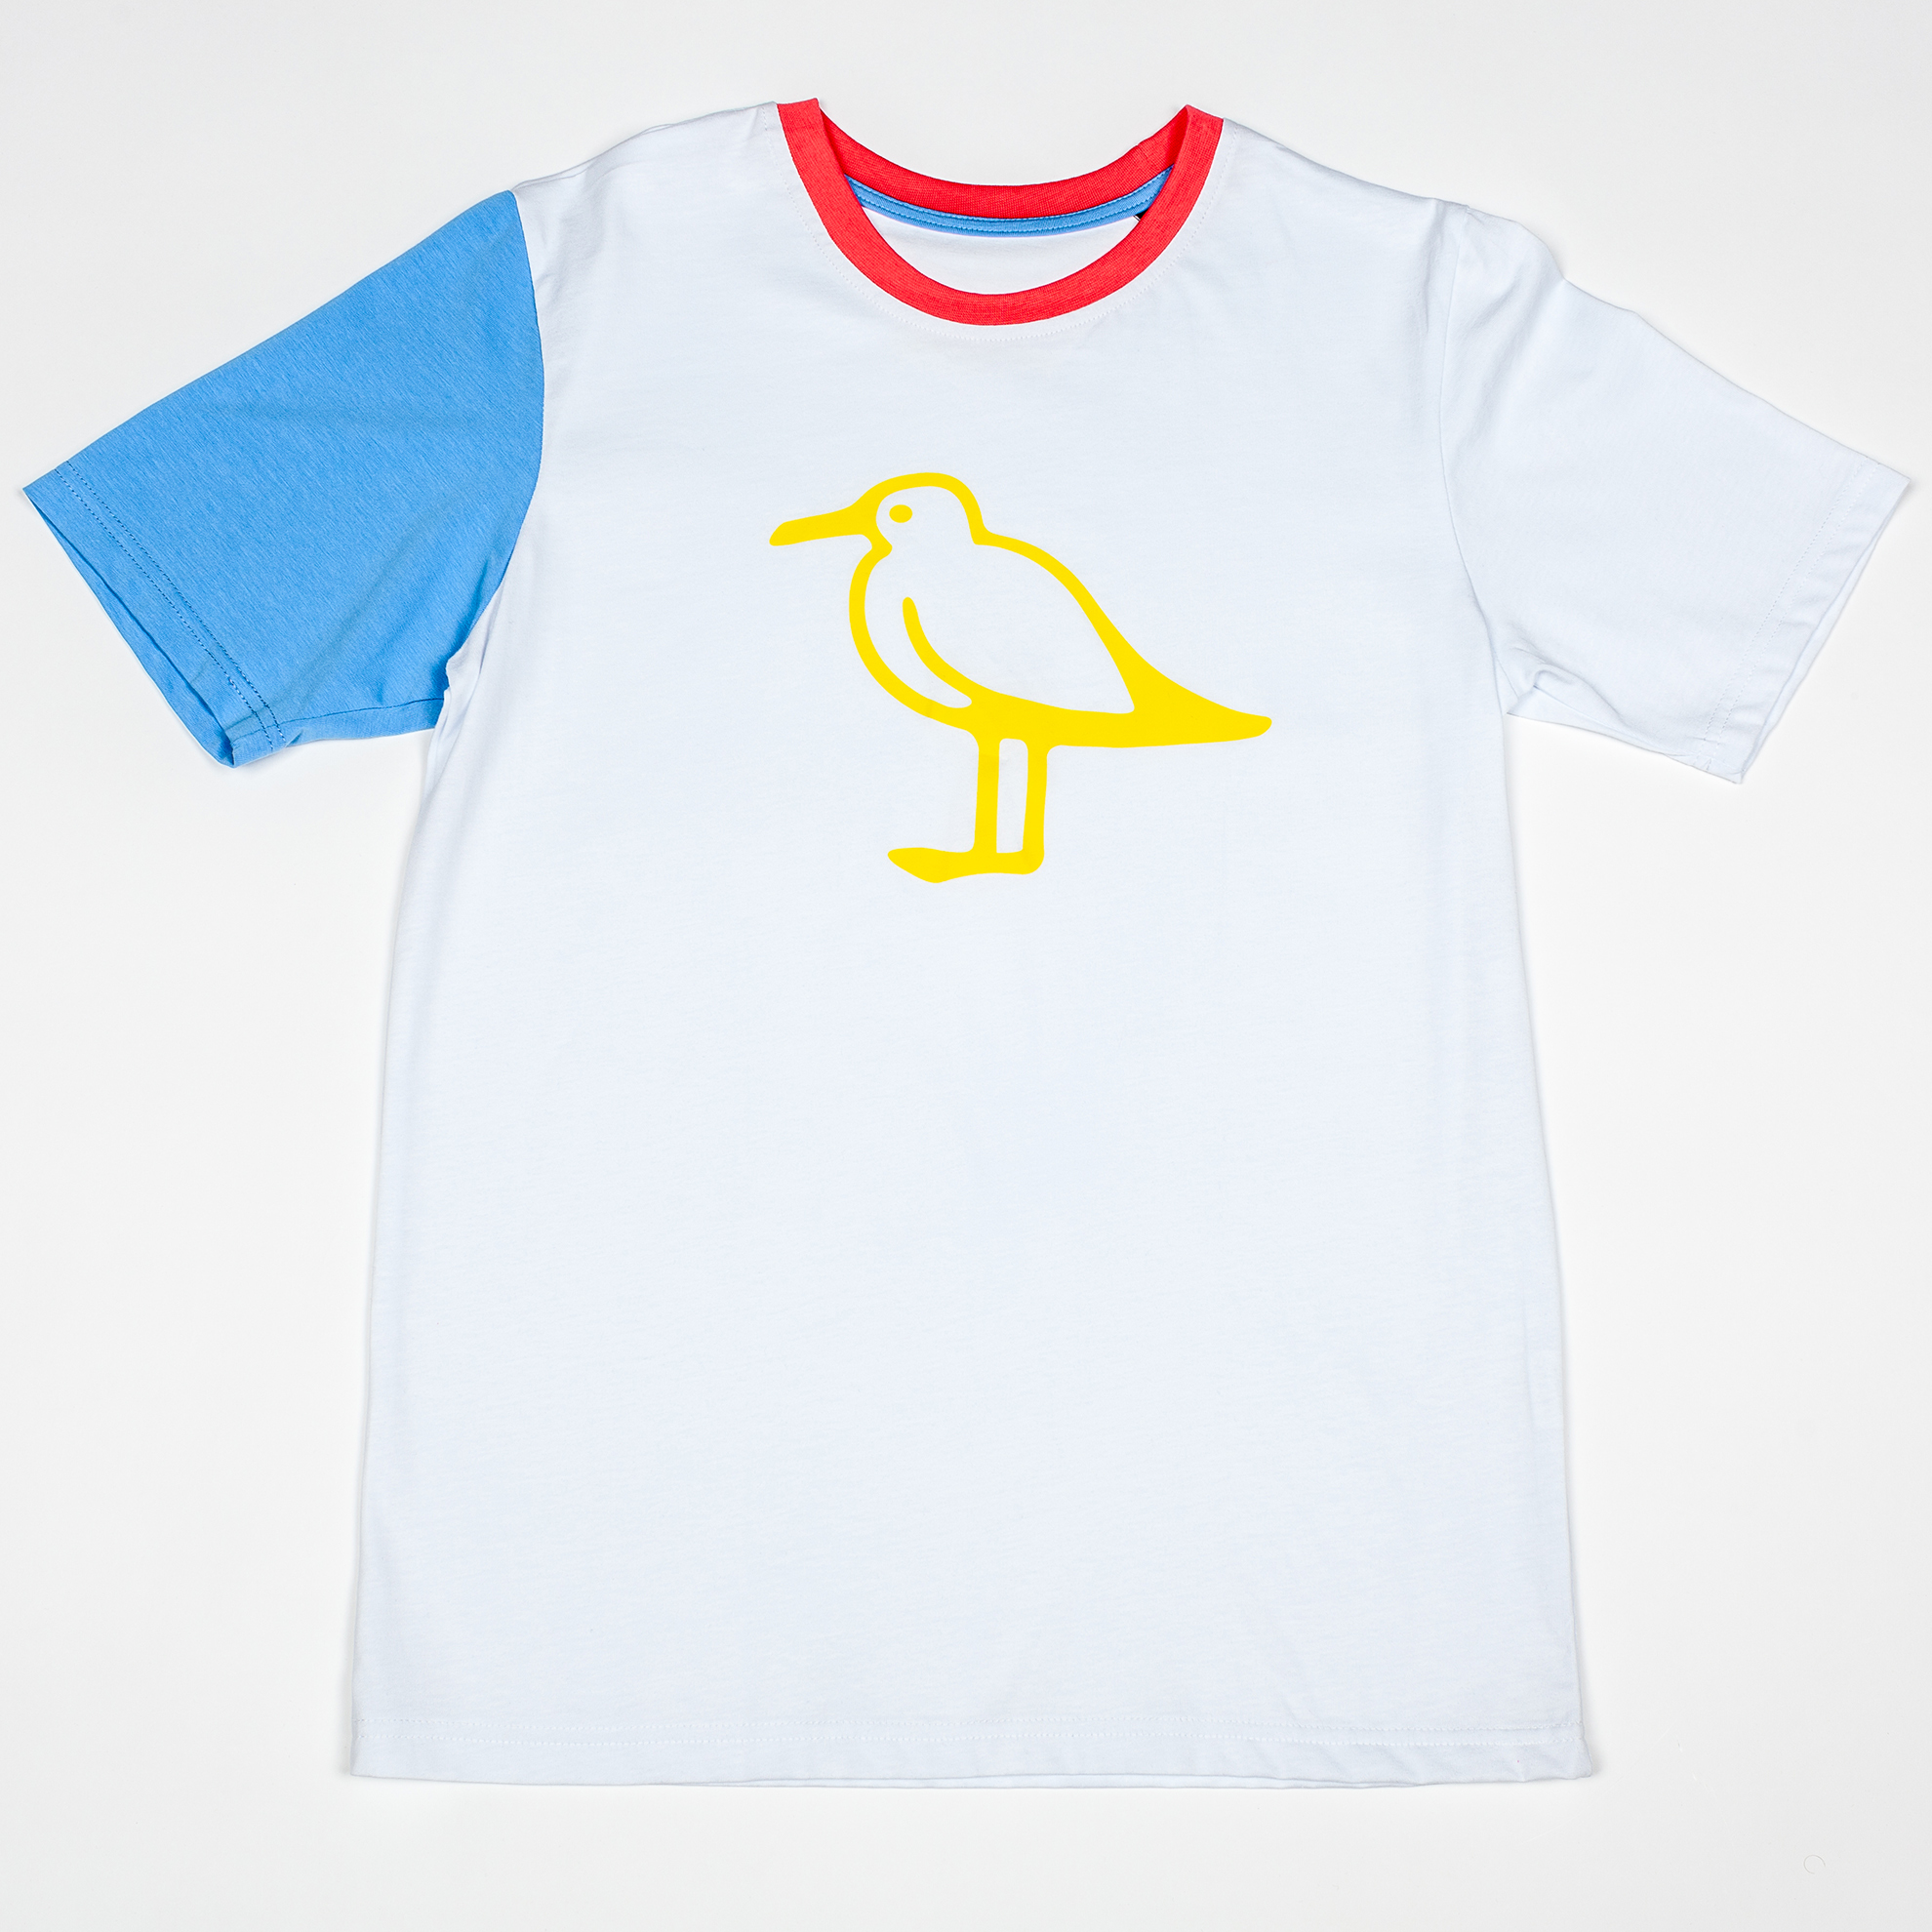 Многоцветная футболка